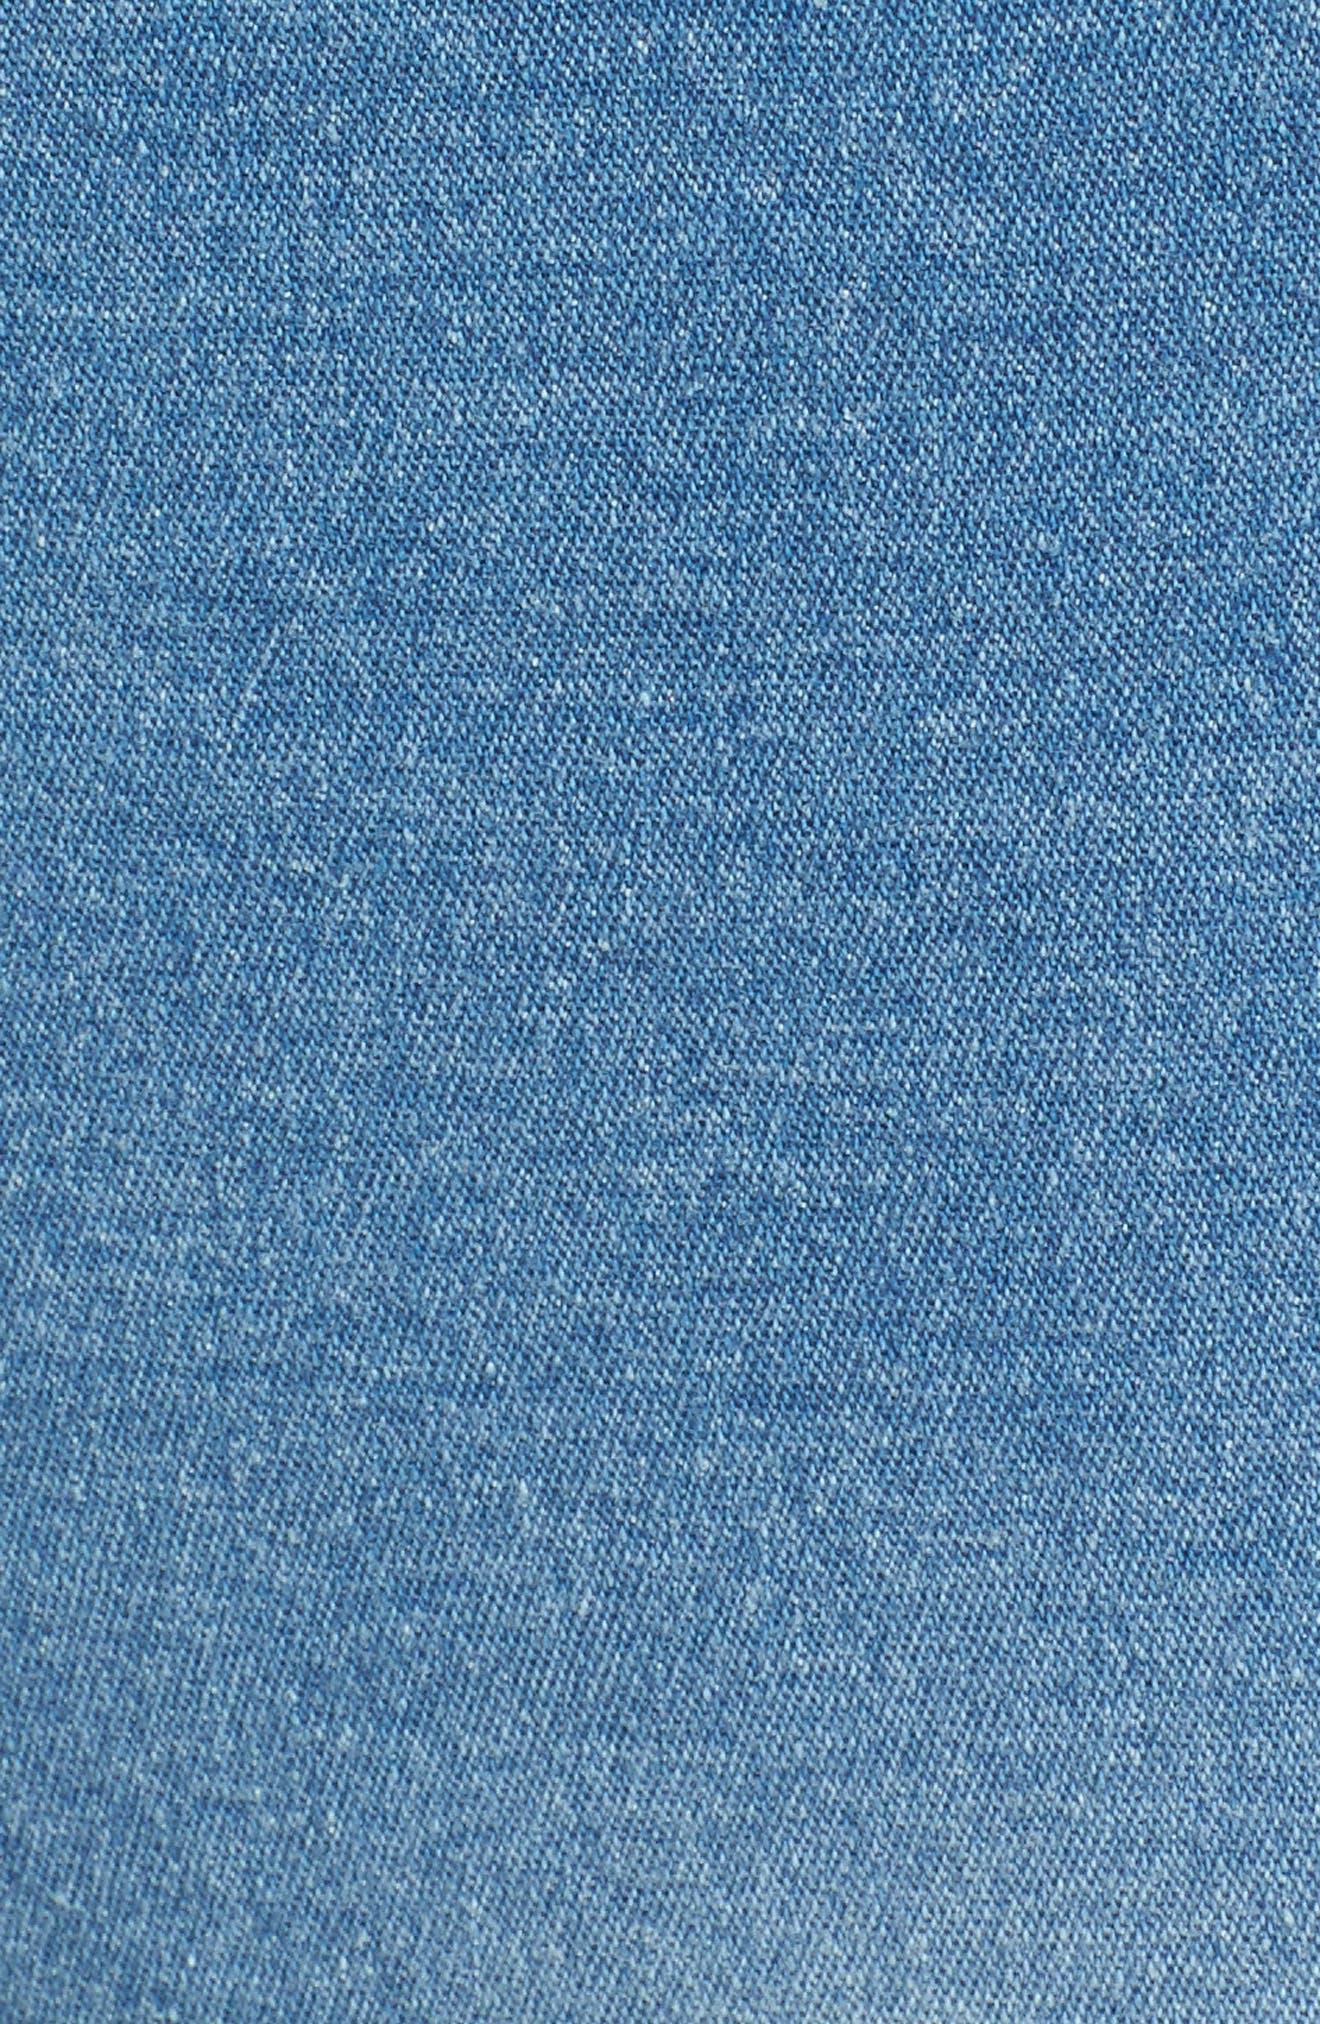 Patched Distressed Denim Skimmer Leggings,                             Alternate thumbnail 5, color,                             484